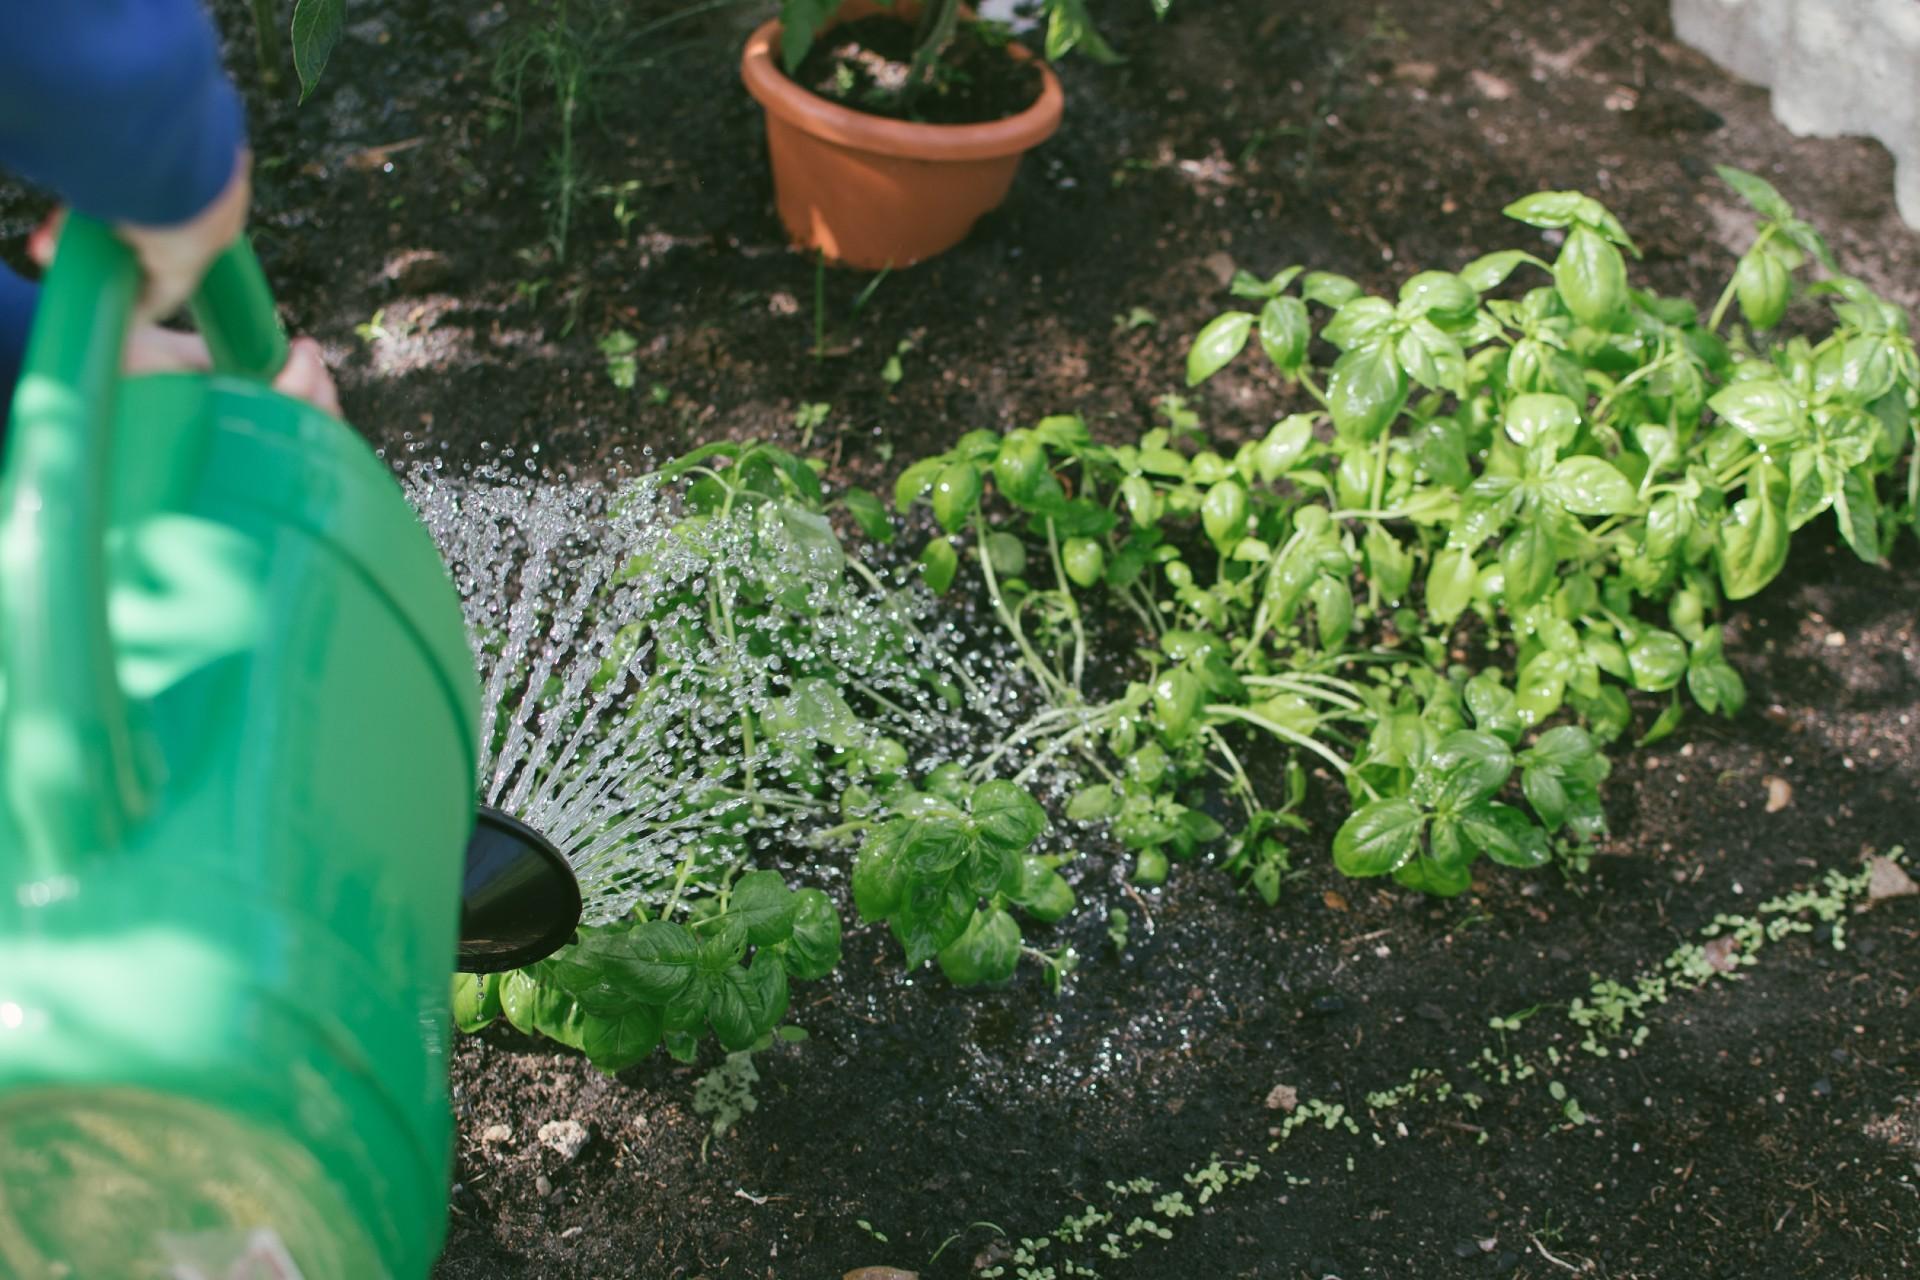 Gardening-unsplash-blog-story